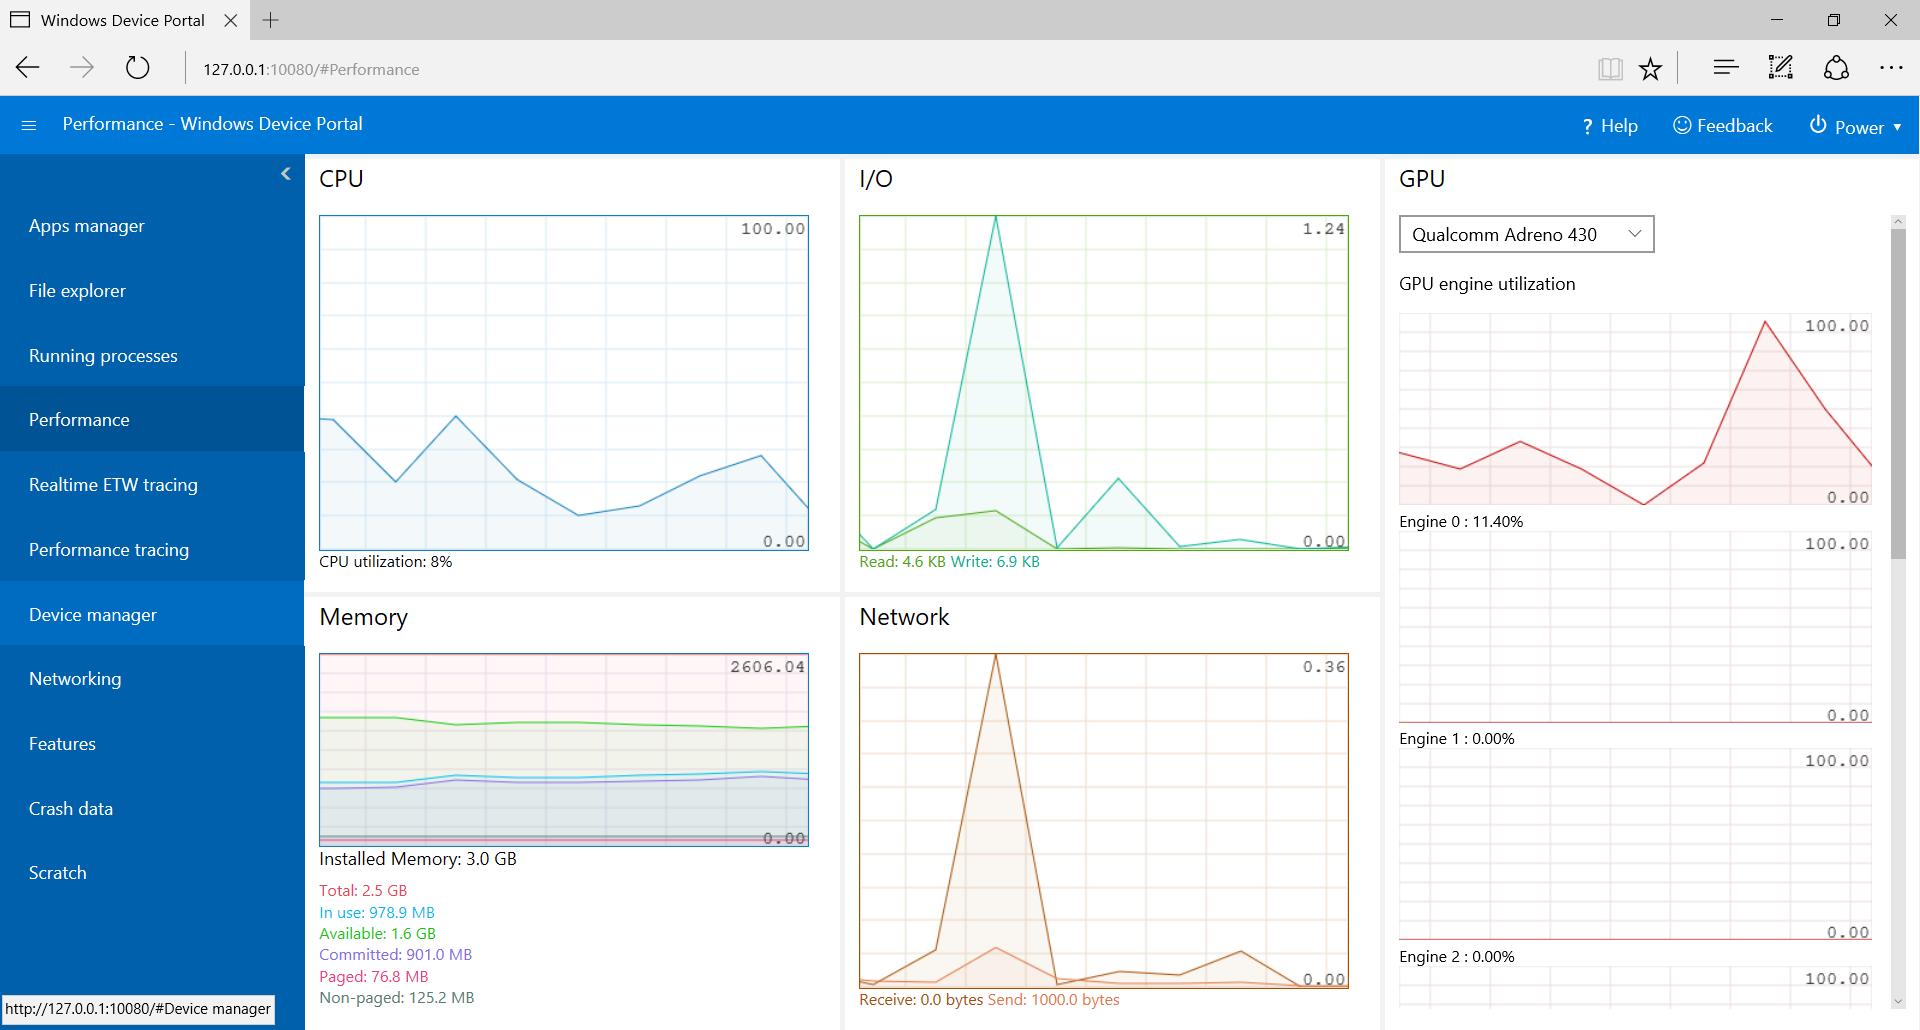 Introducción a Windows Device Portal - UWP app developer | Microsoft ...